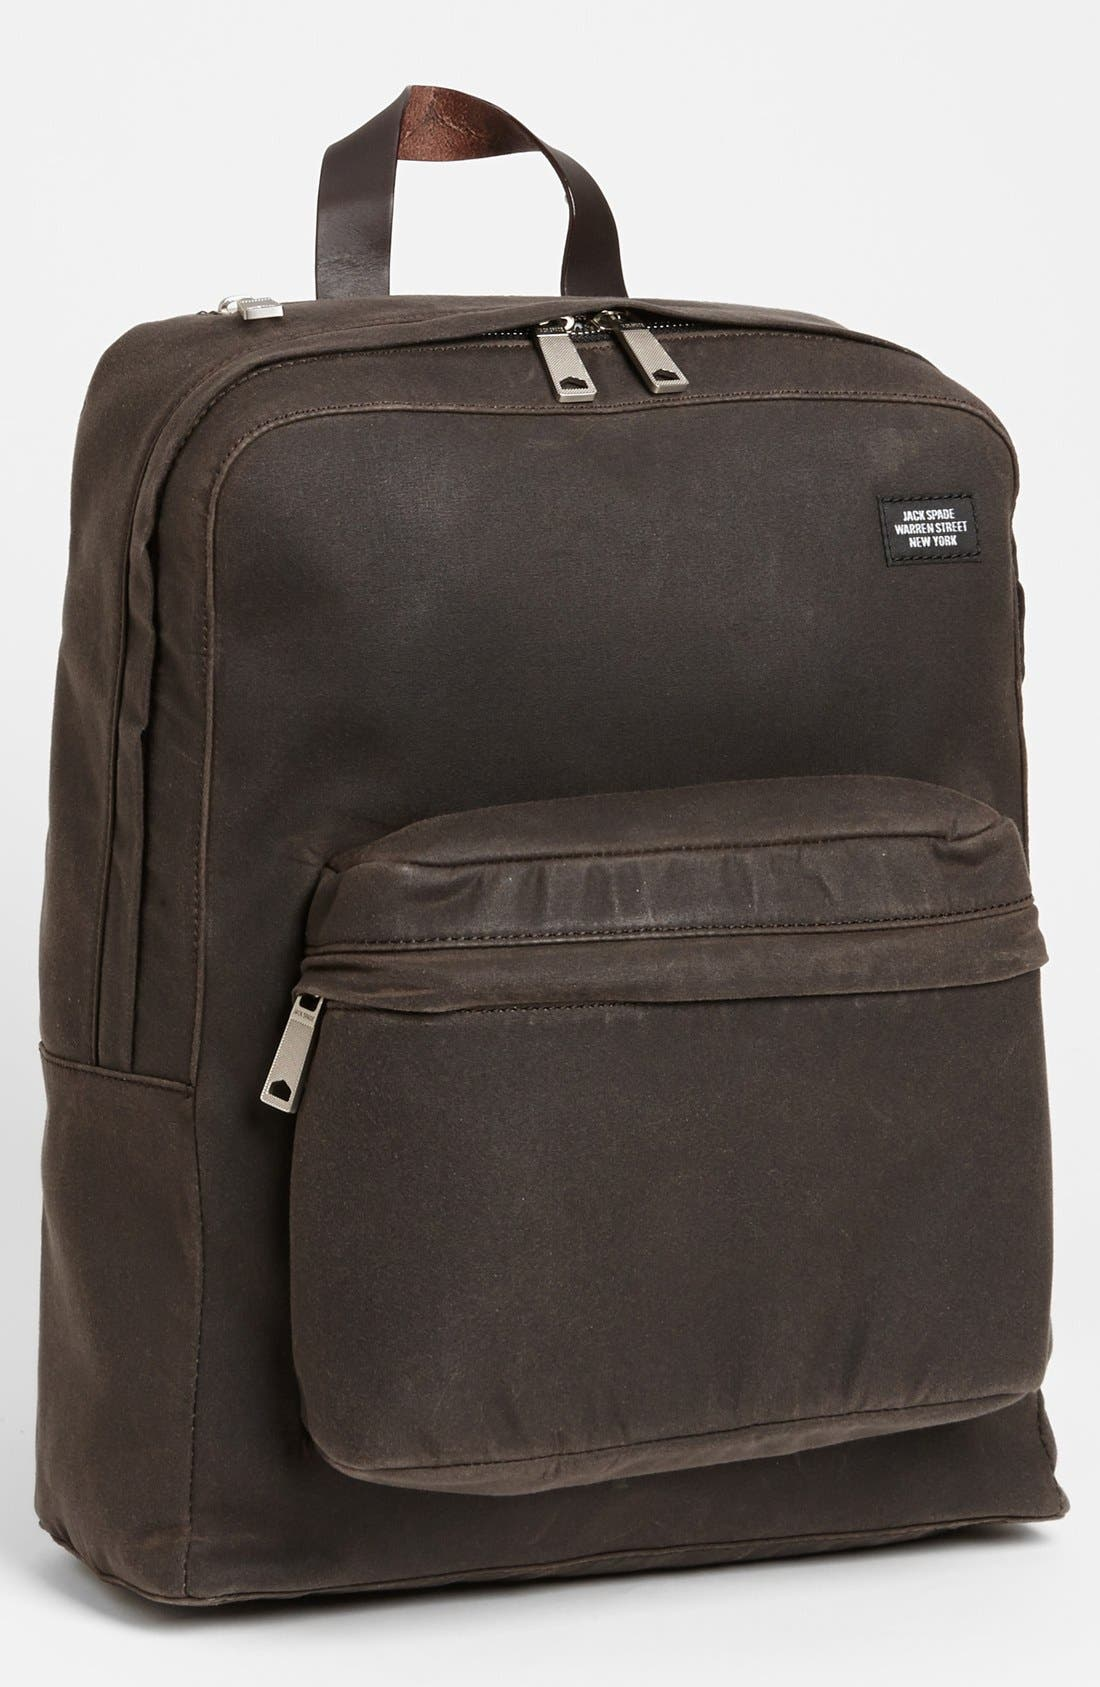 JACK SPADE 'Waxwear' Backpack, Main, color, 215